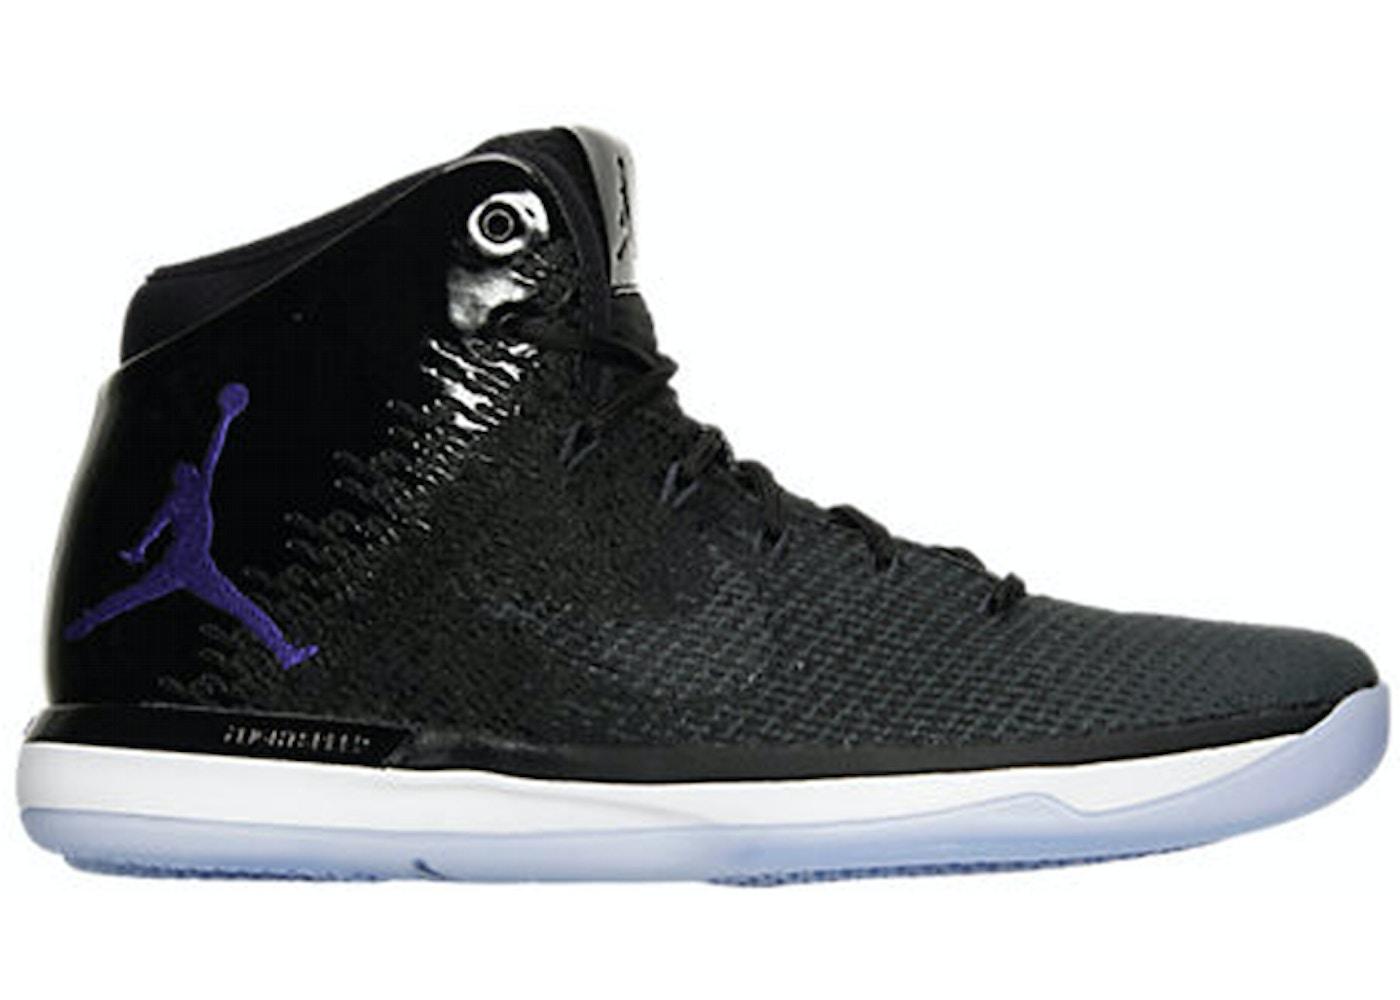 low priced 688d6 2cff6 Buy Air Jordan 31 Shoes & Deadstock Sneakers